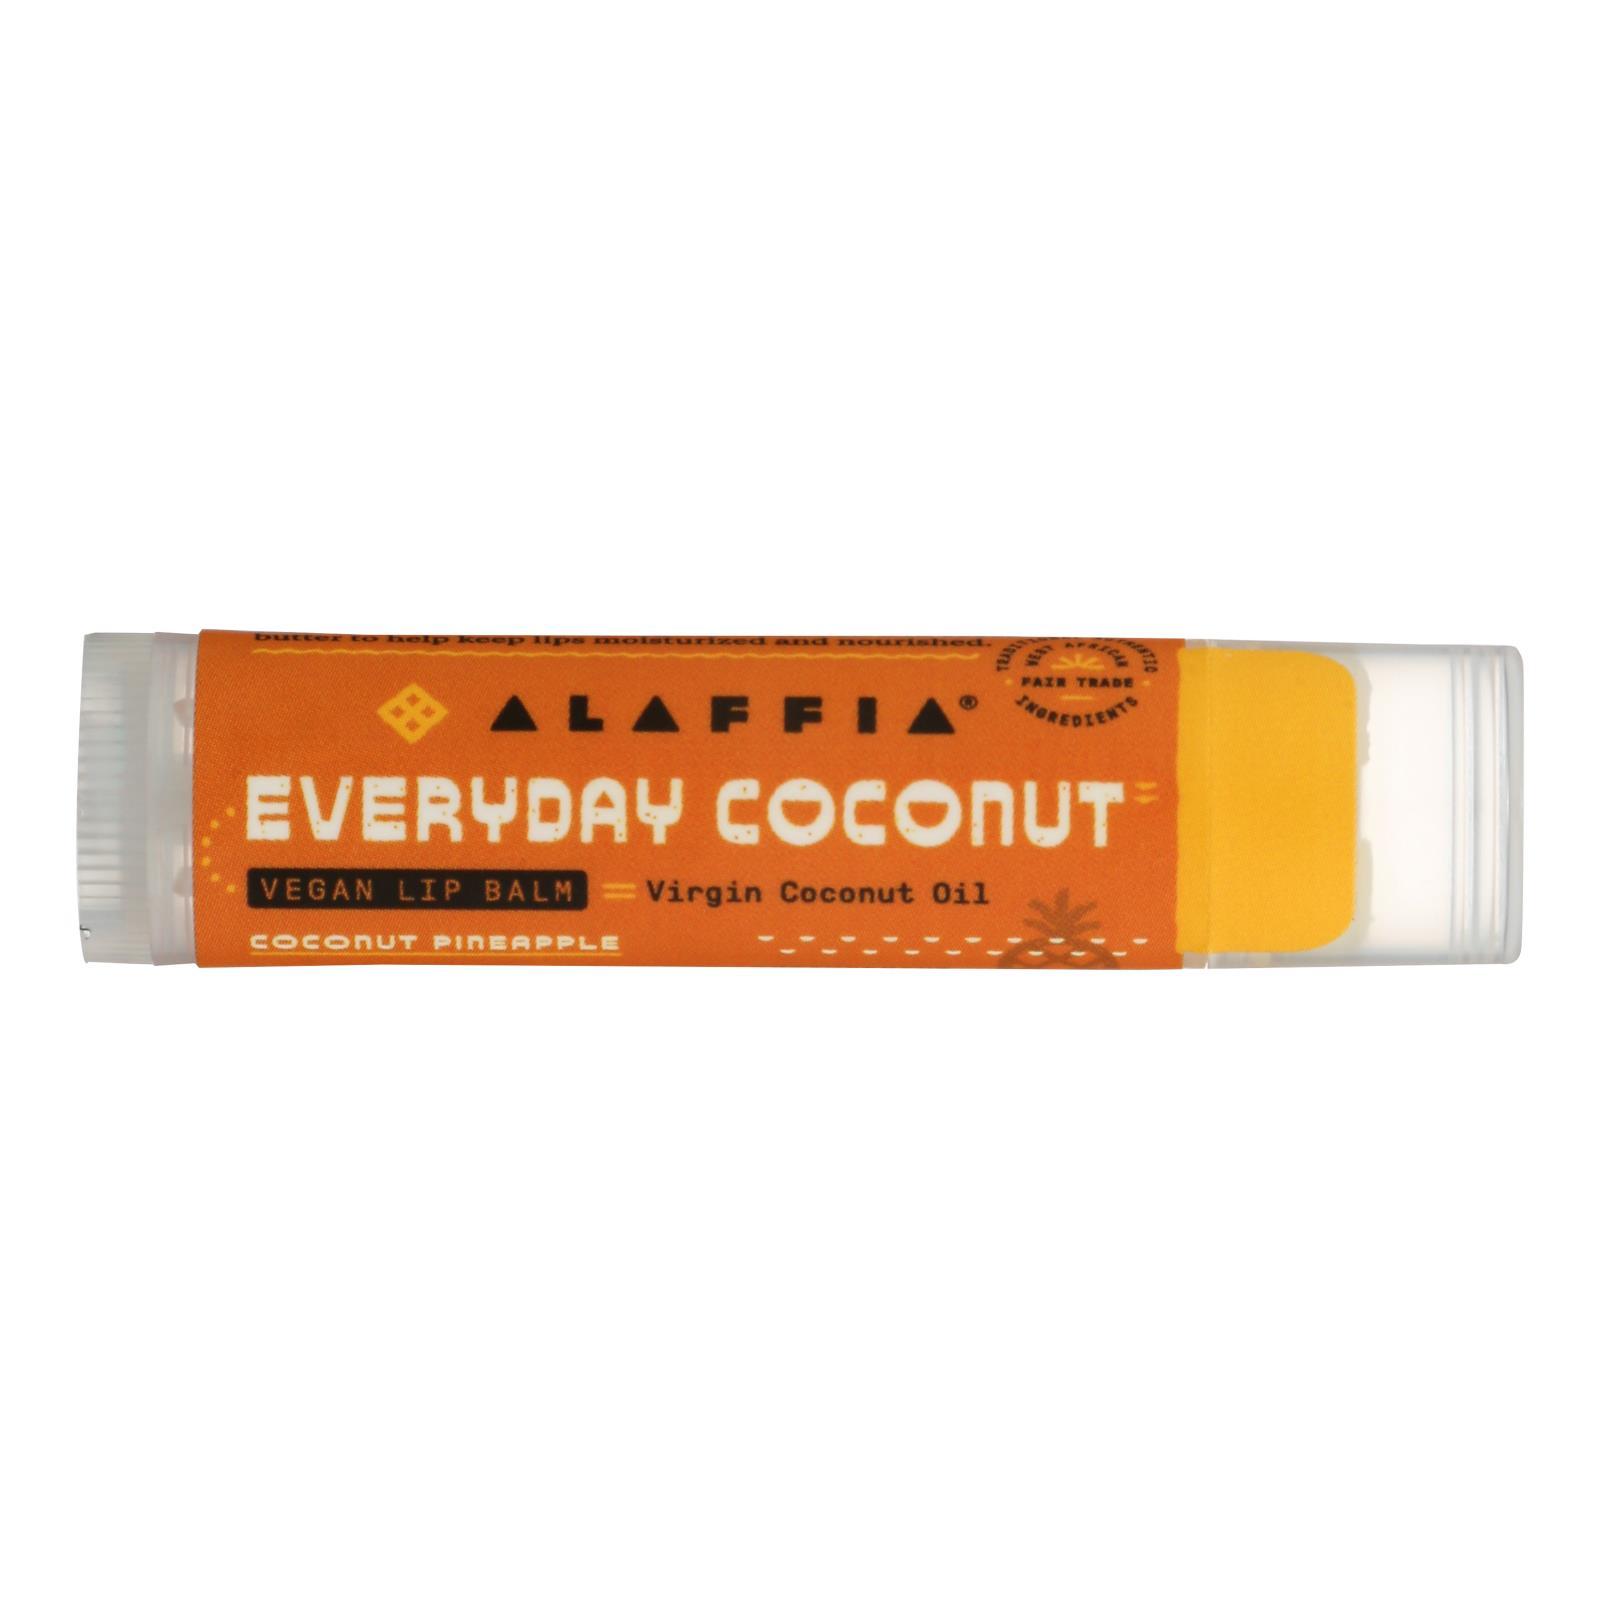 Everyday Coconut's CoconutPineapple Lip Balm - Case of 24 - .15 OZ %count(alt)